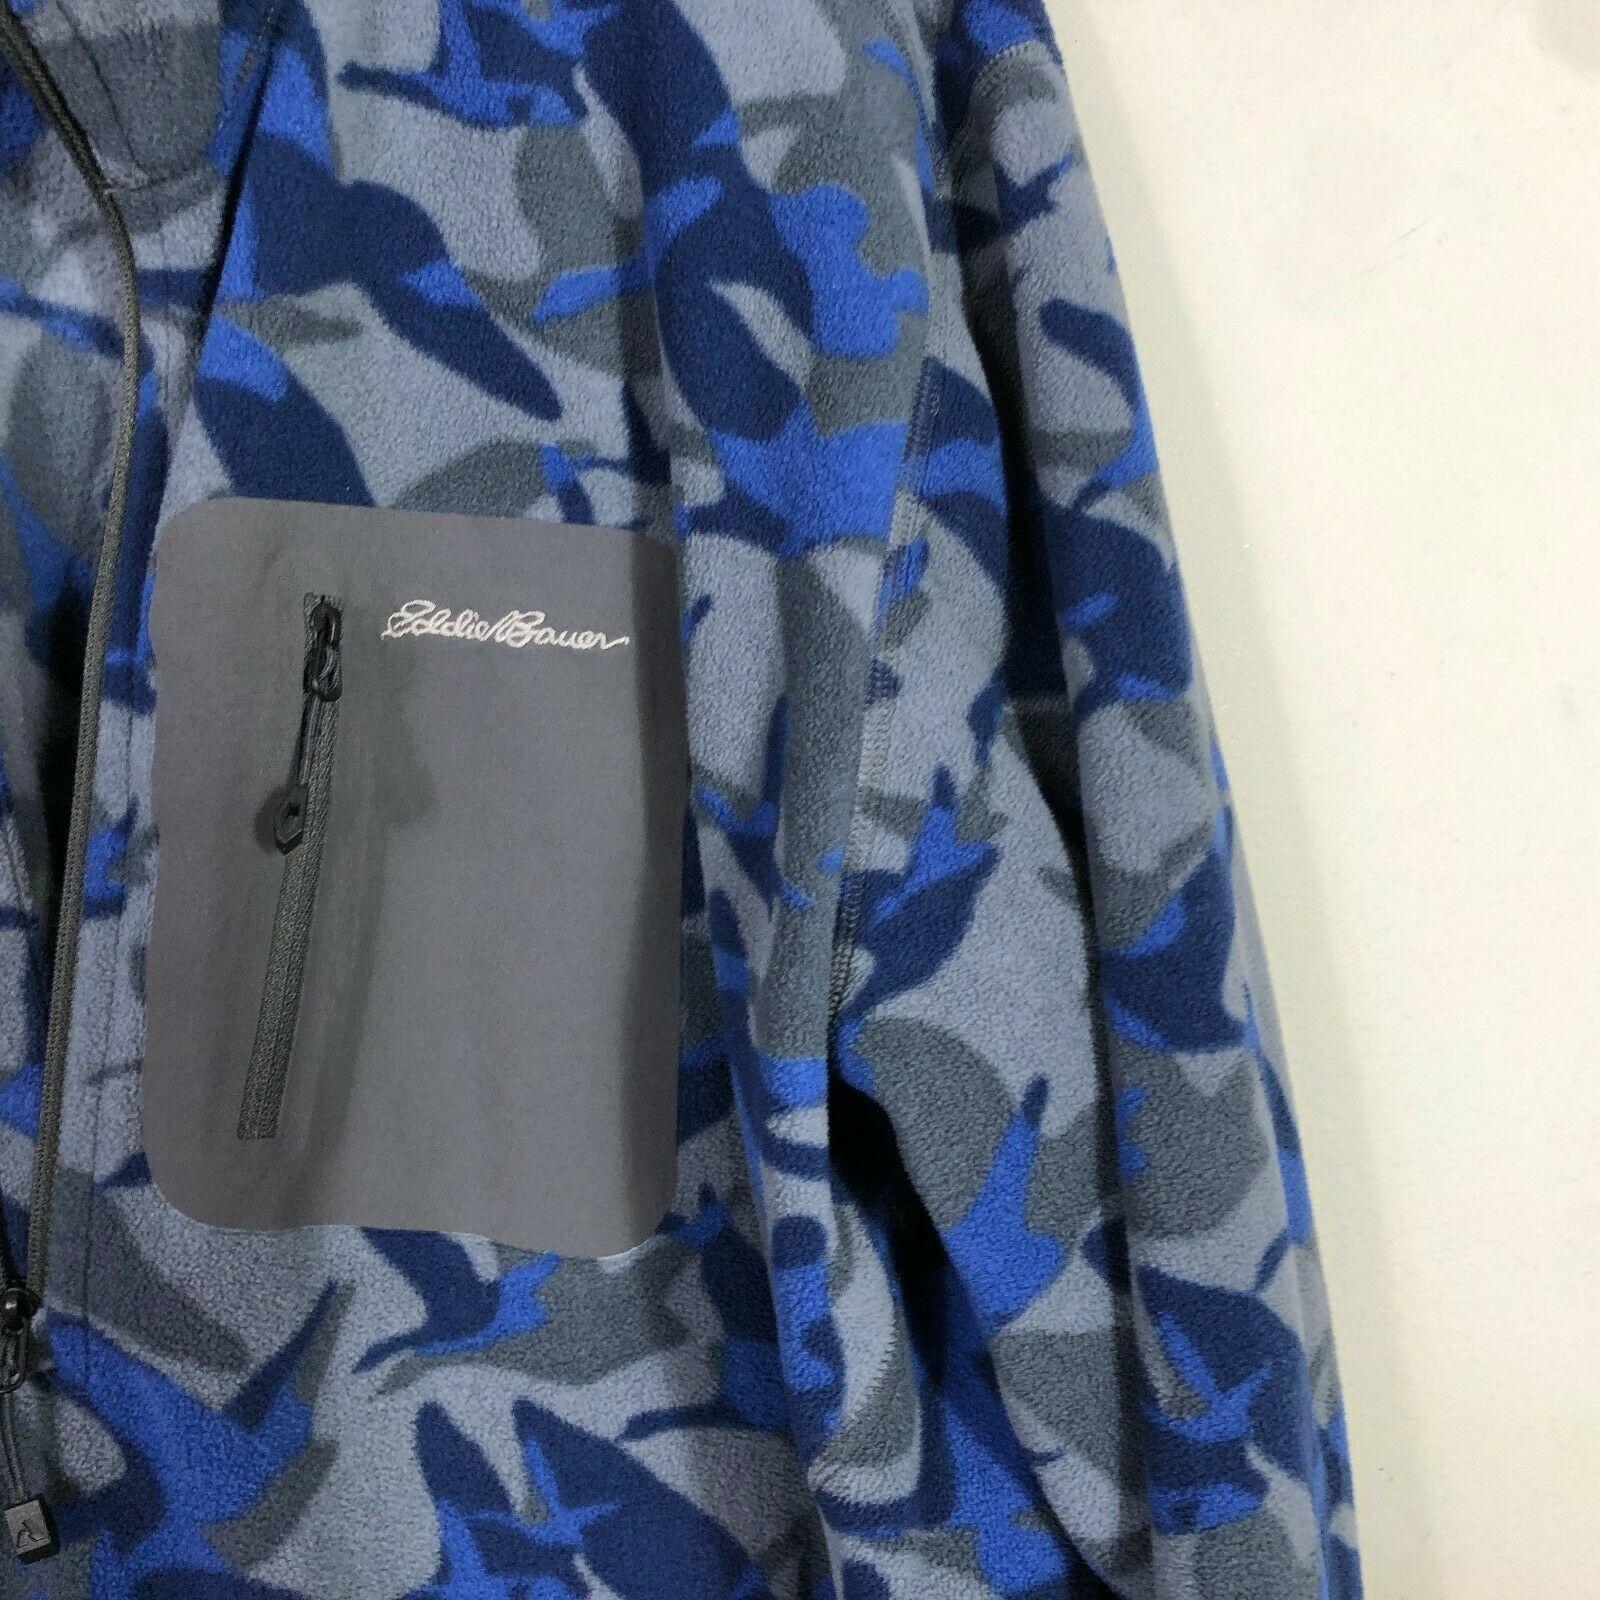 Eddie Bauer First Ascent Fleece Jacket 1/2 Zip Men's 2XL Blue Gray Long Sleeve image 3